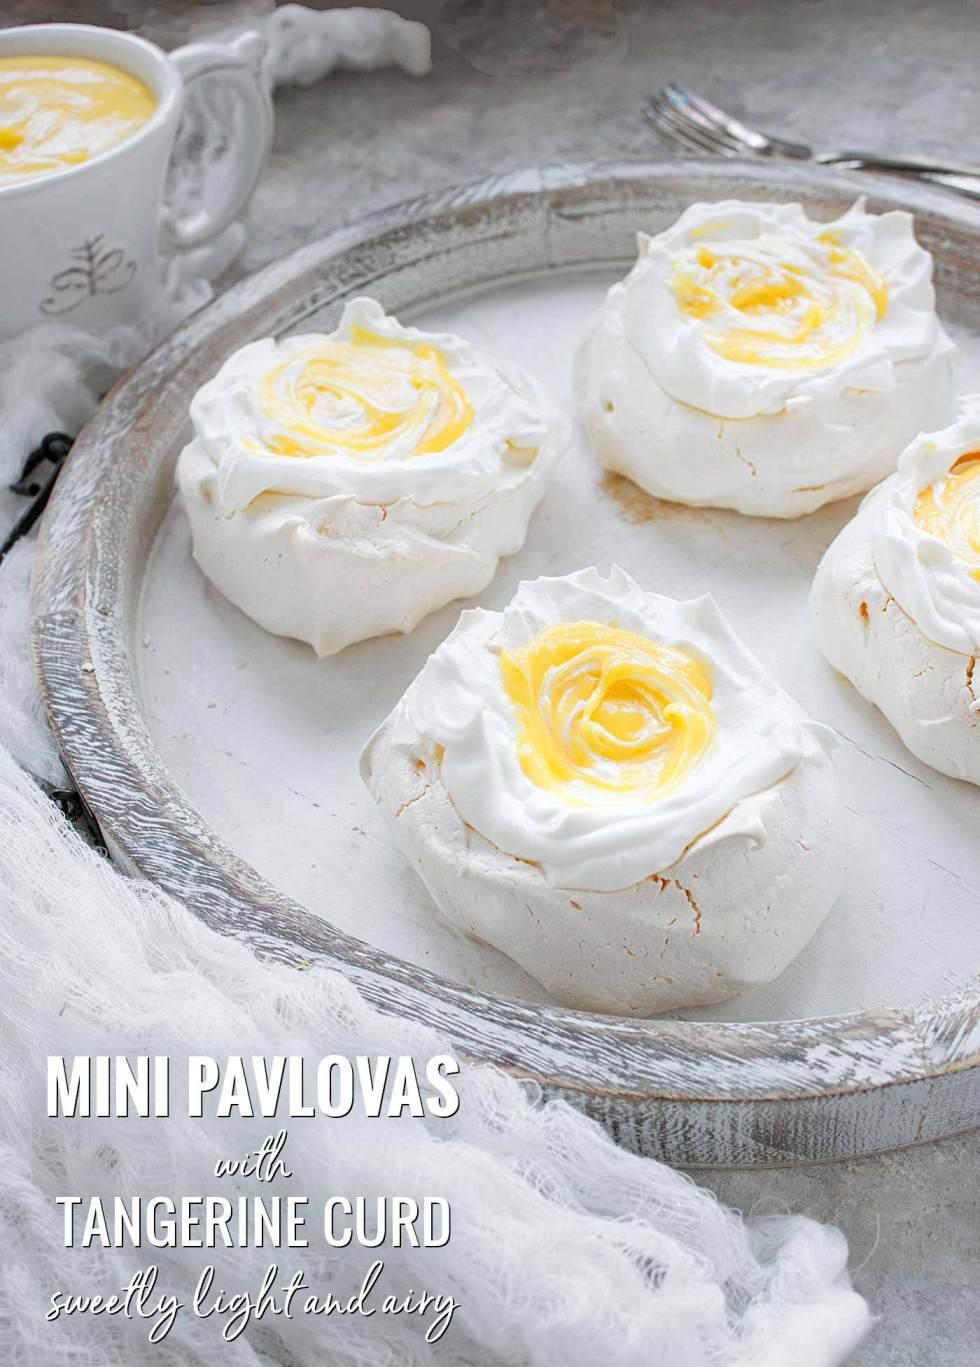 Mini Pavlovas with Tangerine Curd - Recipe at SoupAddict.com